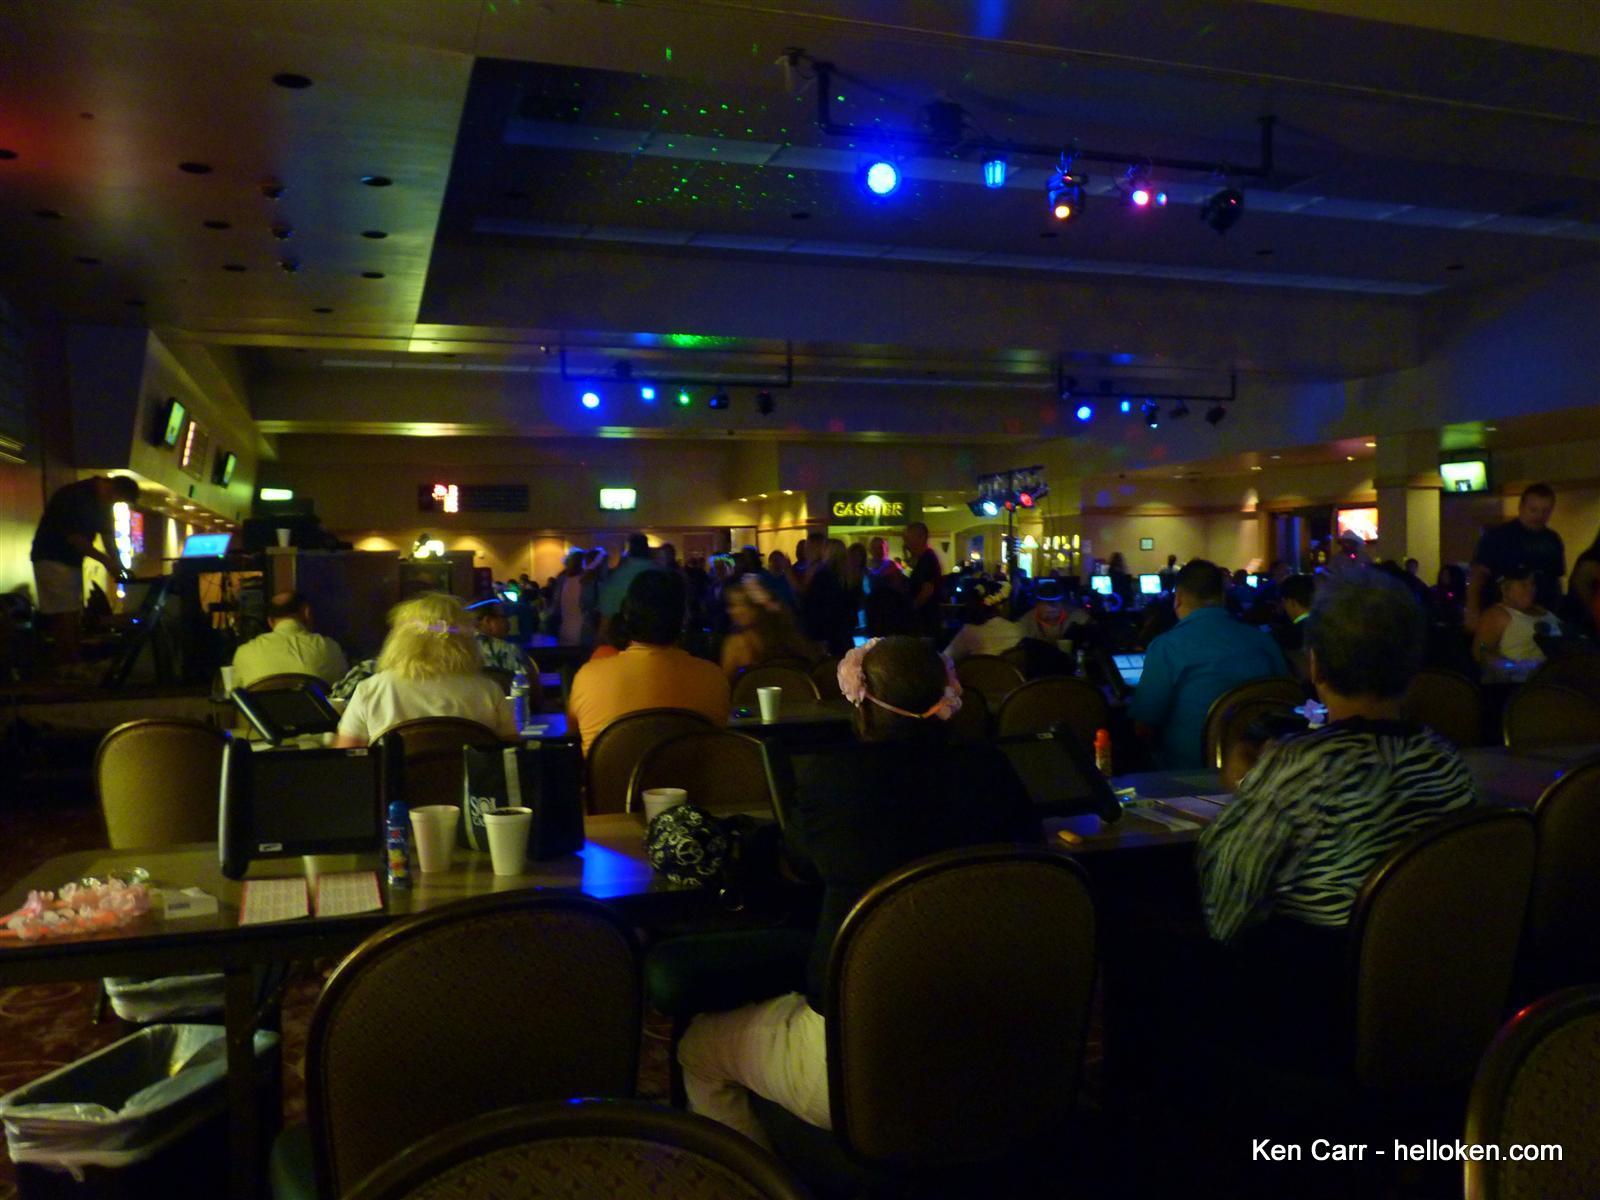 Casino hotels near 1300 n. 12th st phx az reason why gambling should be illegal